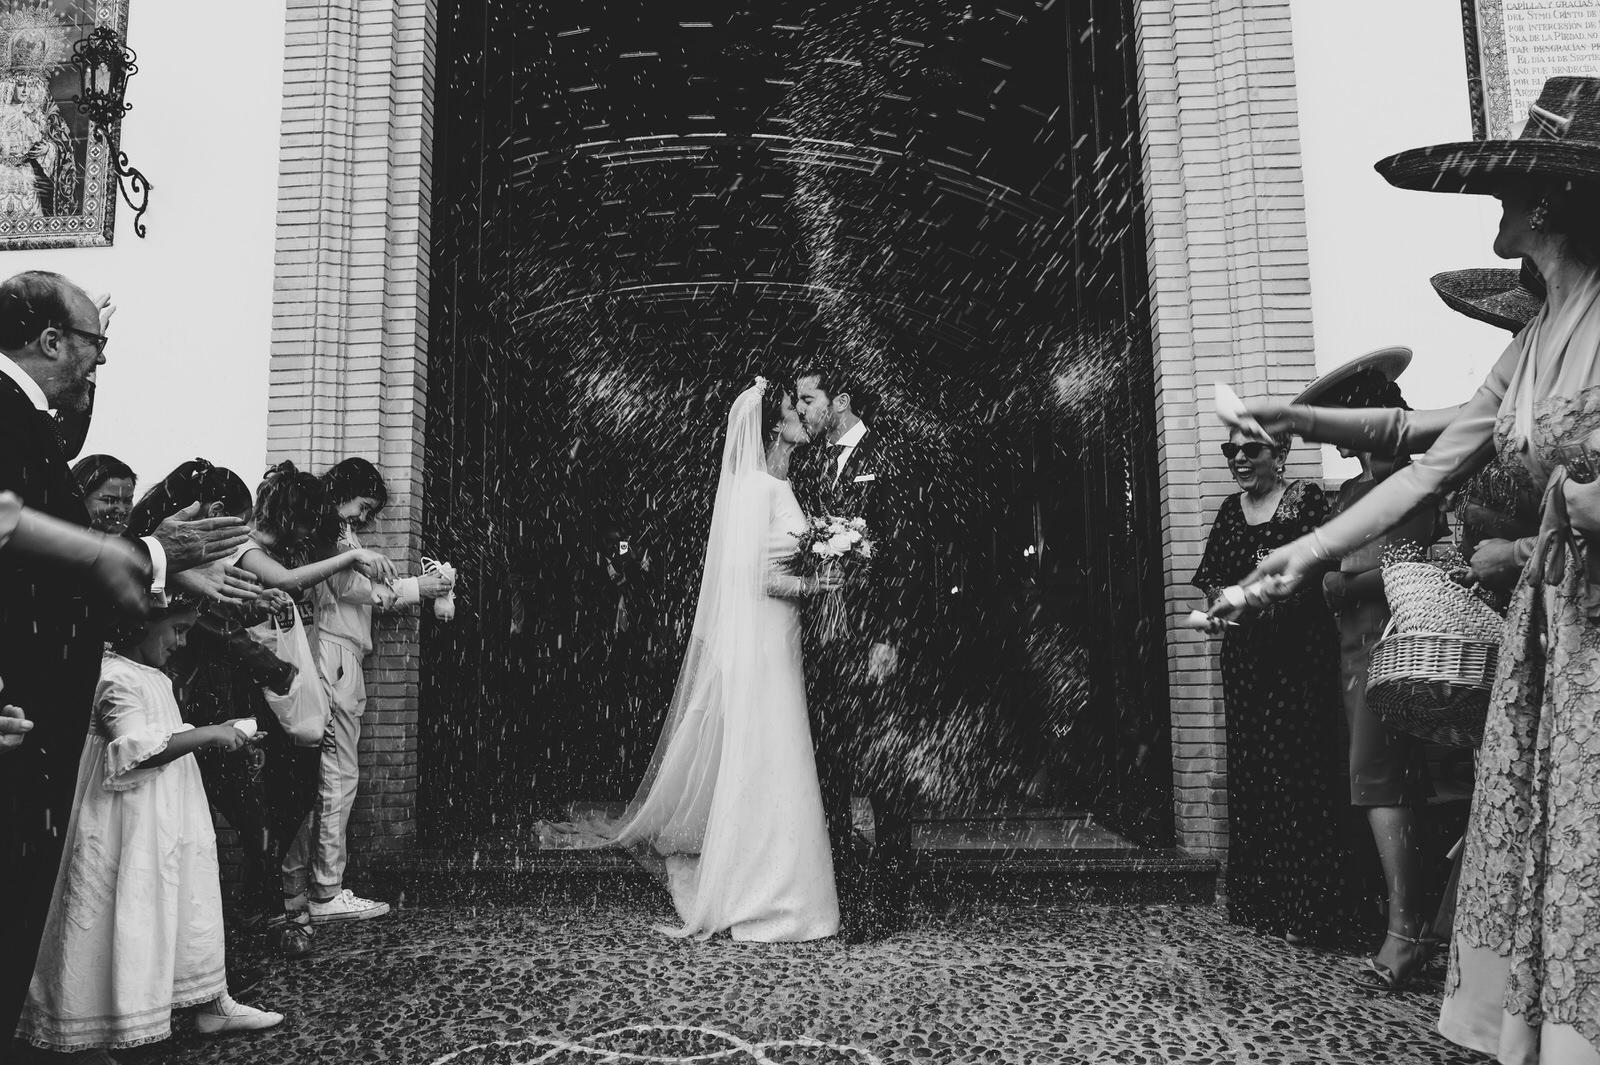 Judith & Gabriel - Boda en Olivares - Albaida, Fotógrafo de boda Andrés Amarillo - 36.JPG